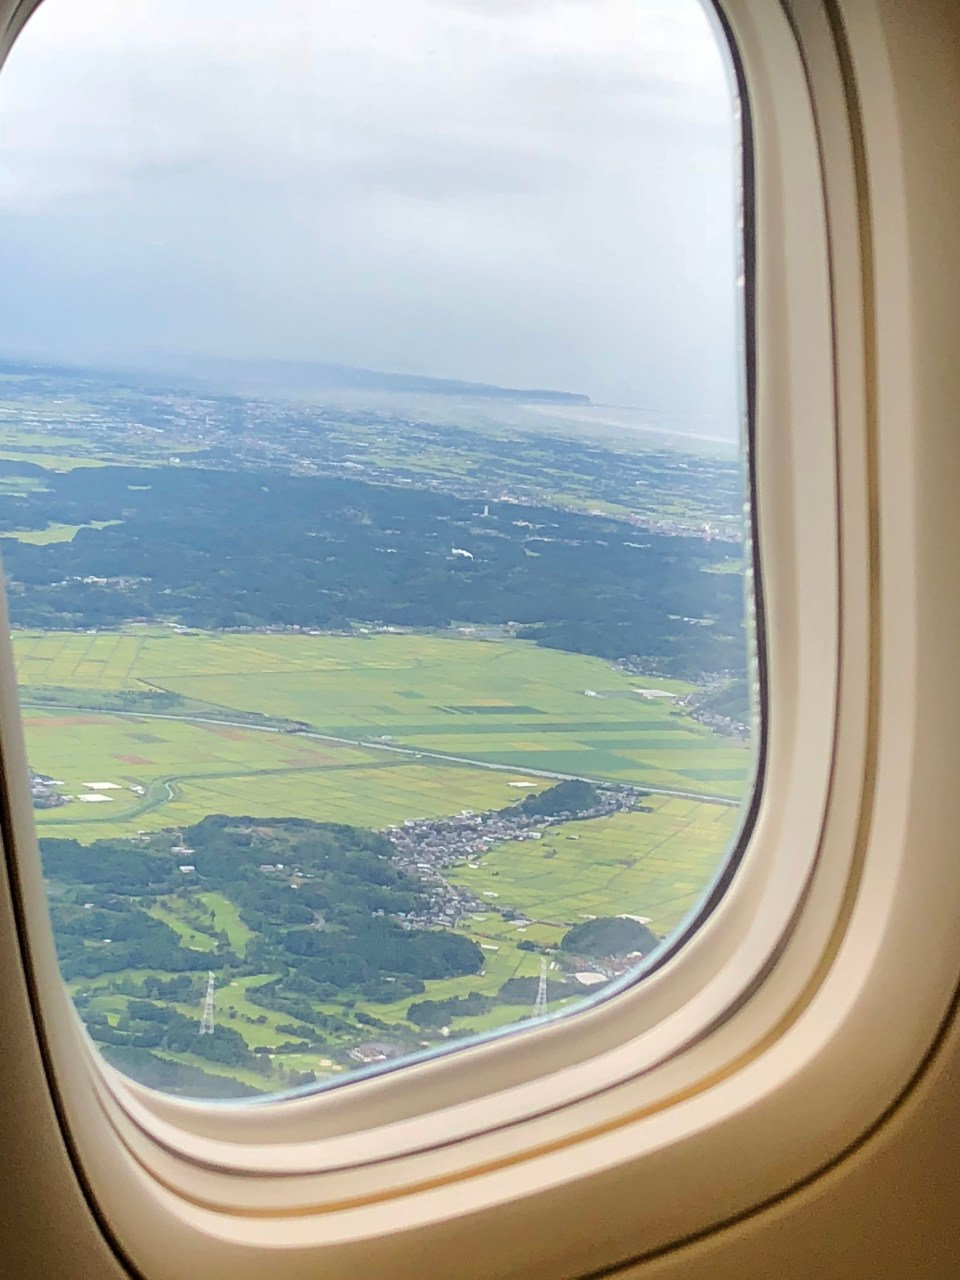 Plane Window - Japan